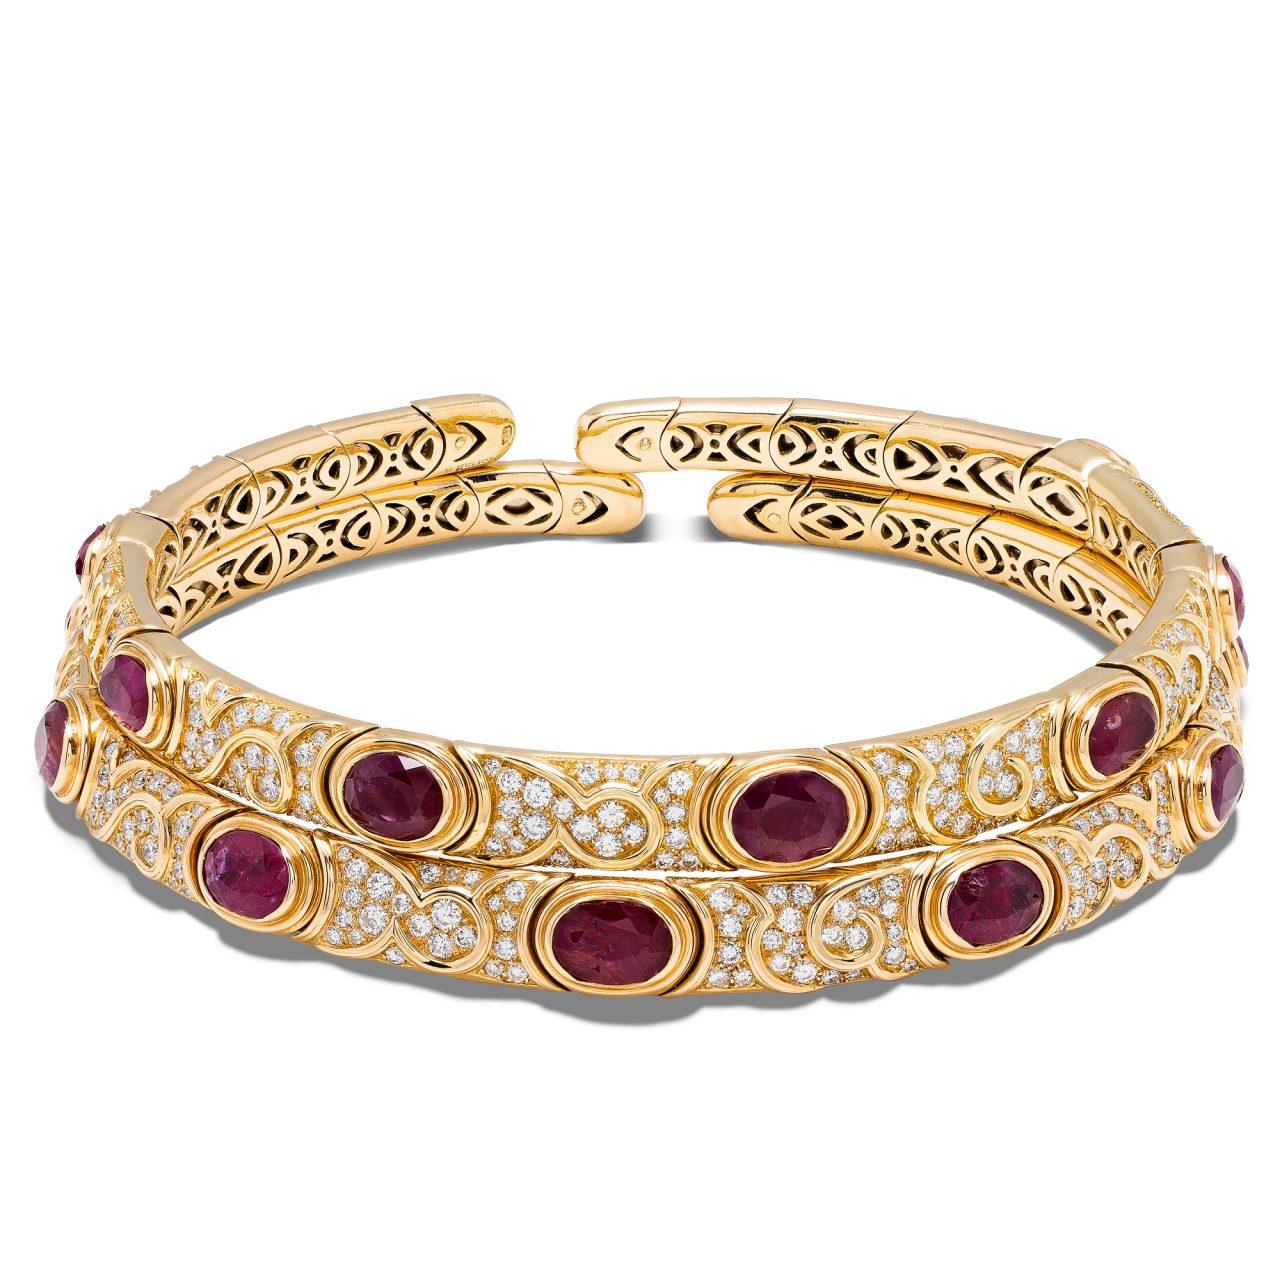 Choker di Marina B. in oro giallo 18k con Rubini e Diamanti